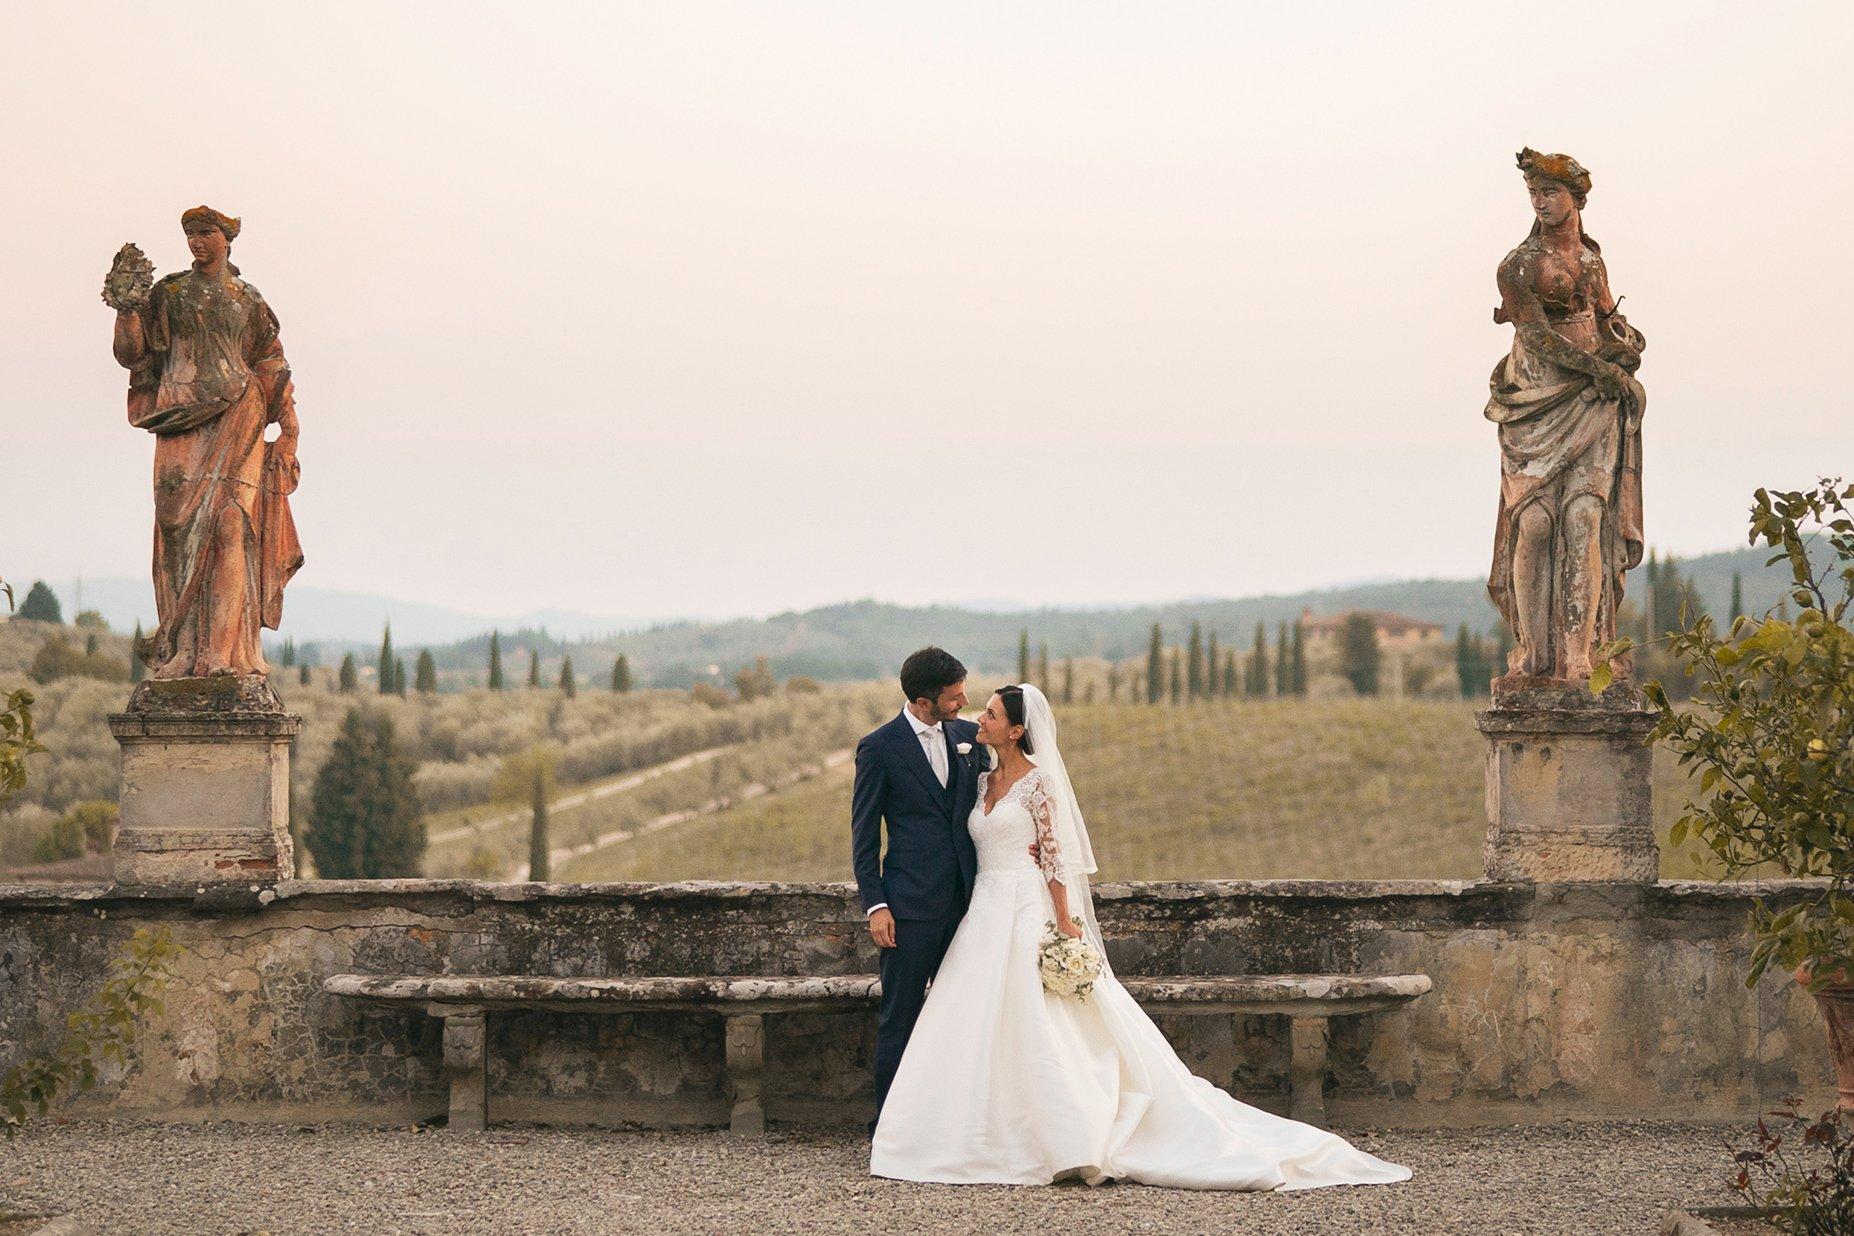 Emotional wedding in Tuscany